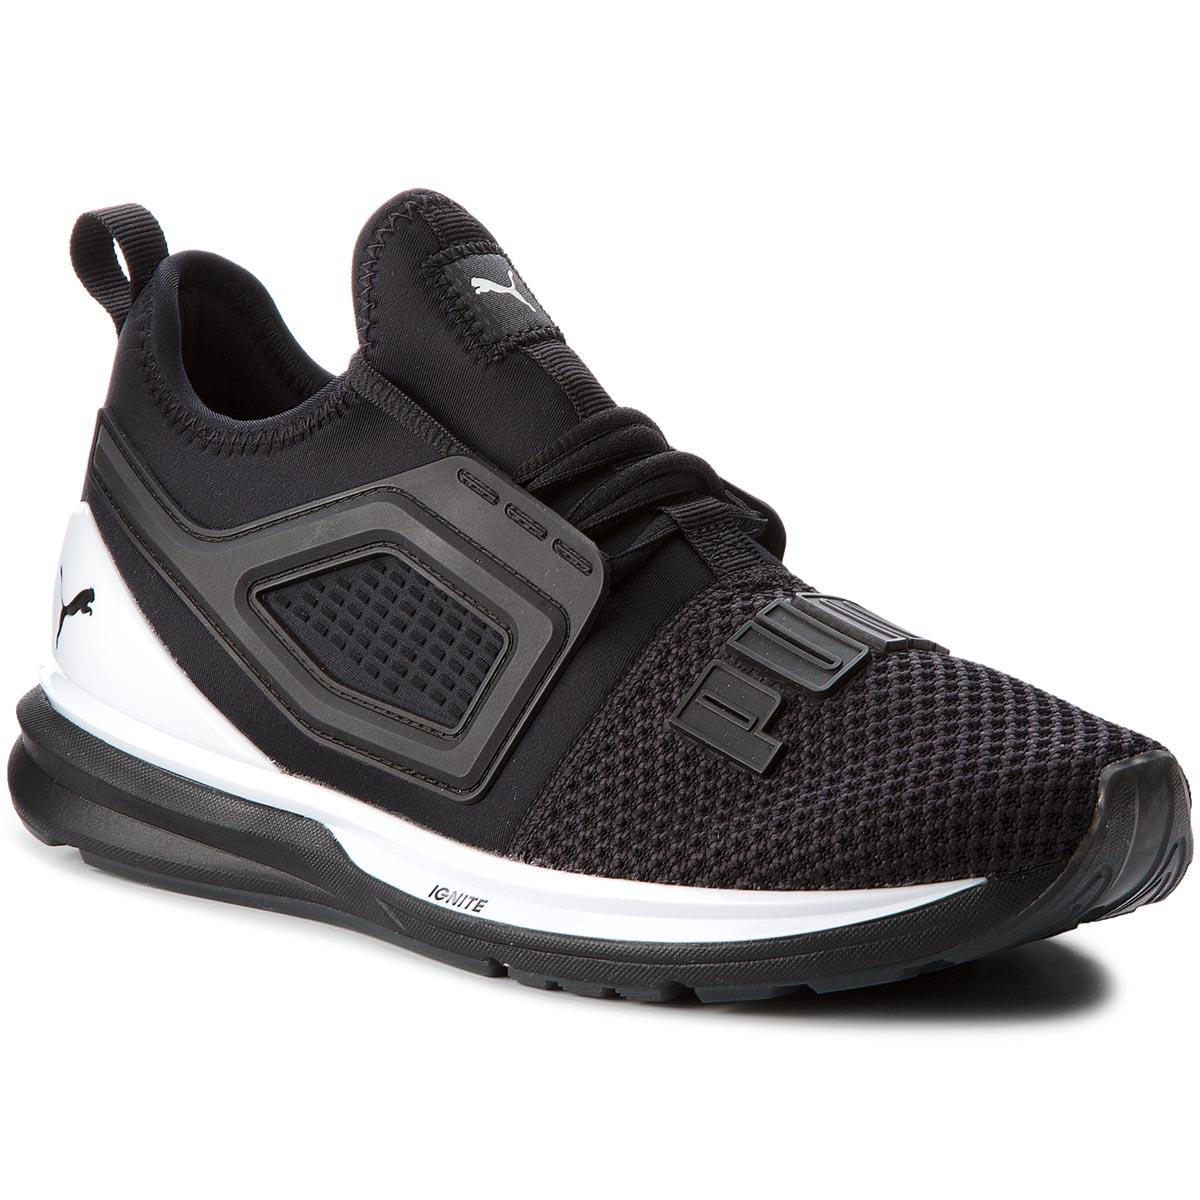 7091acdb5da Sneakers PUMA - Ignite Limitless 189495 01 Puma Black - Sneakers ...